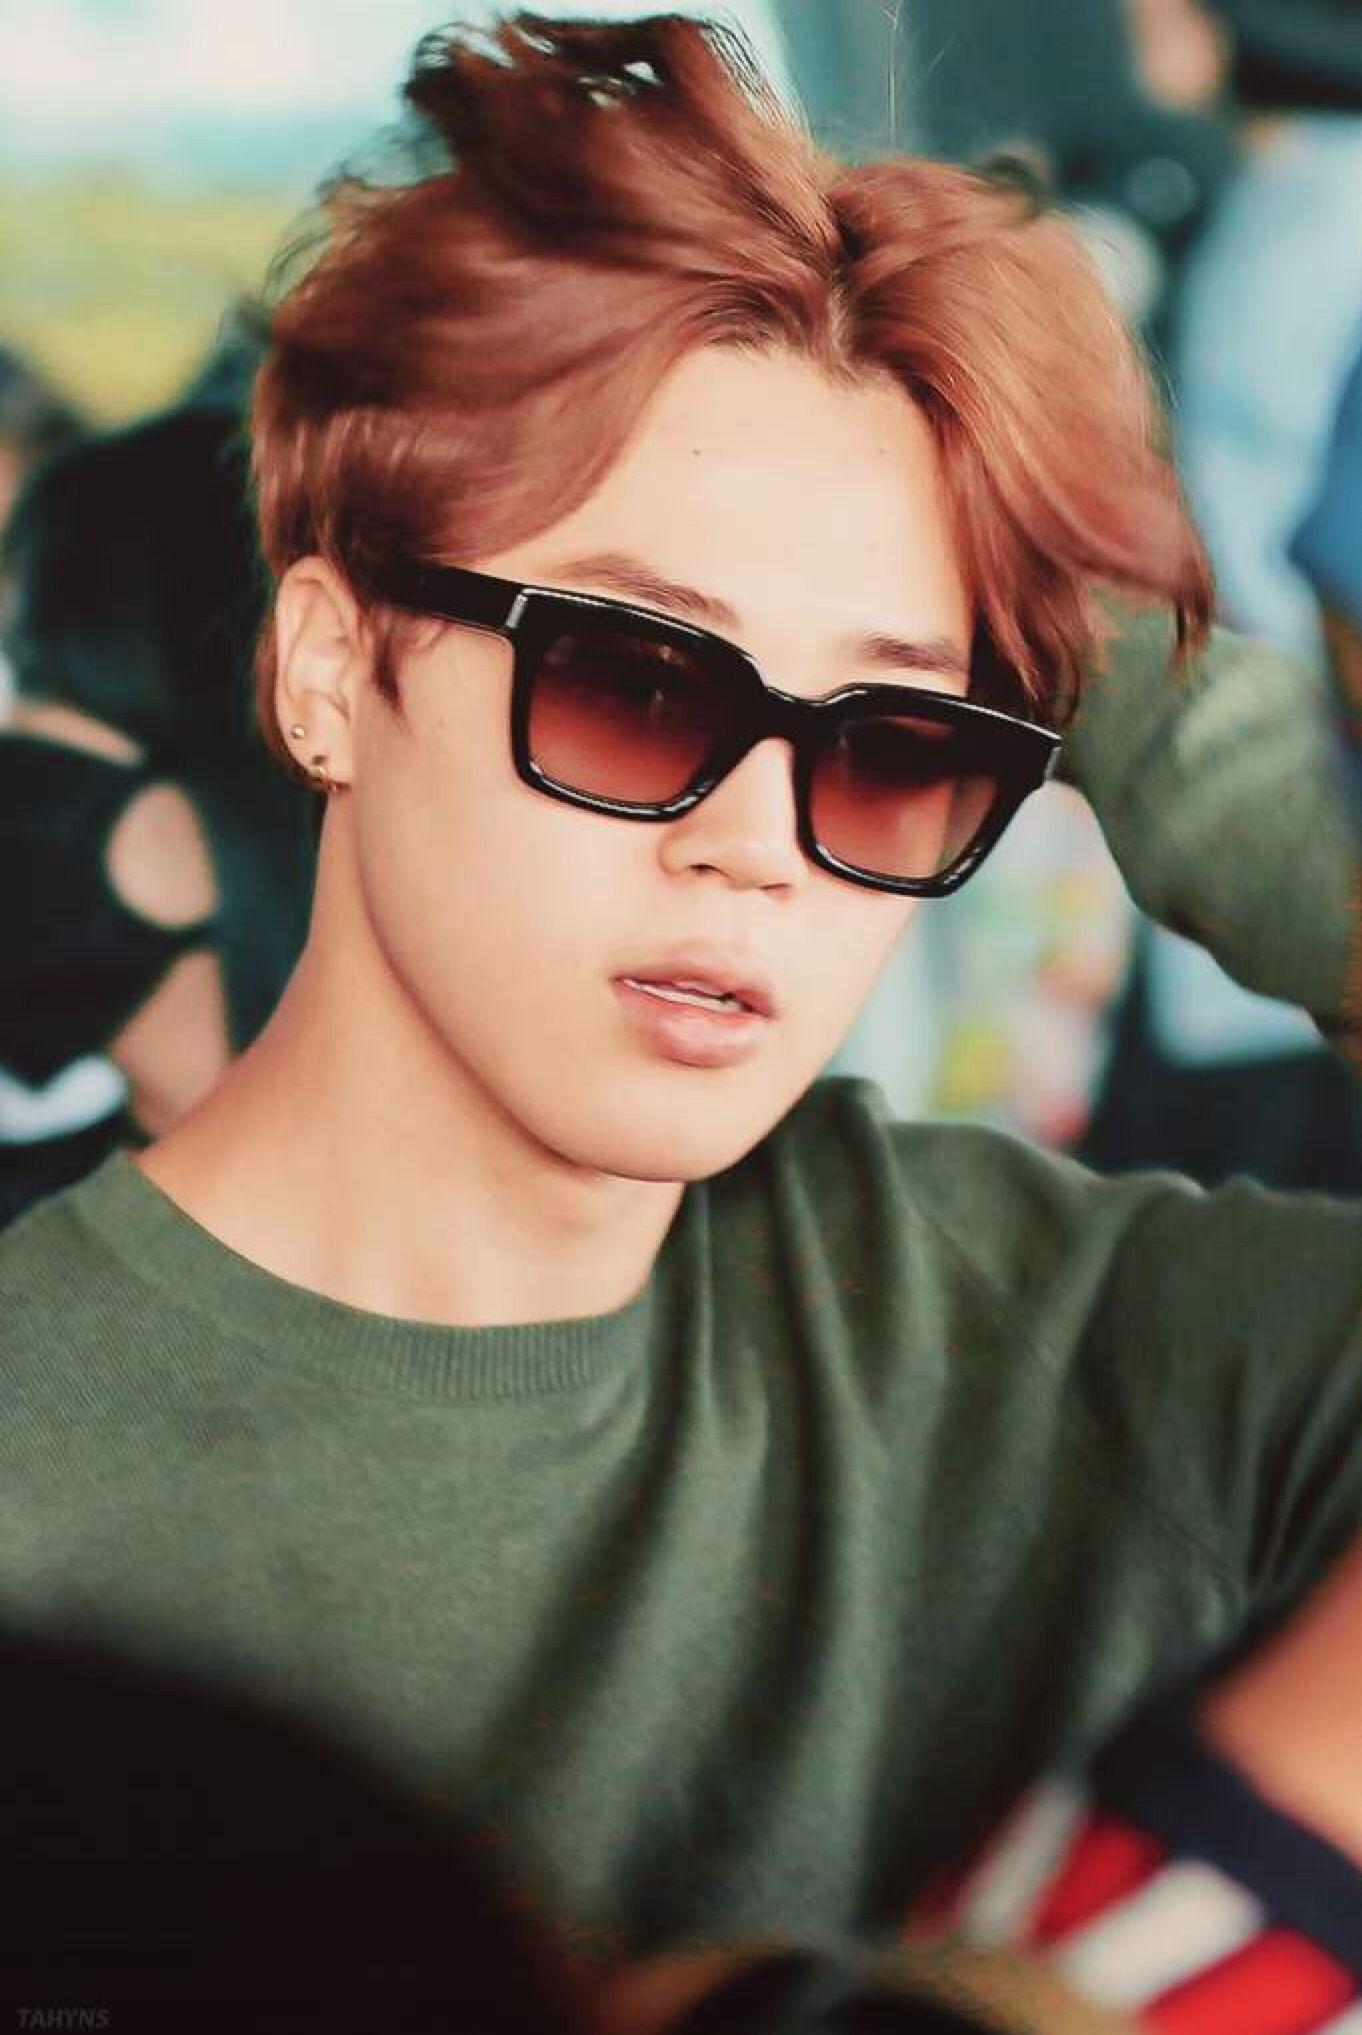 Jimin In Sunglasses Shades Kprofiles Forum Kpop Forums